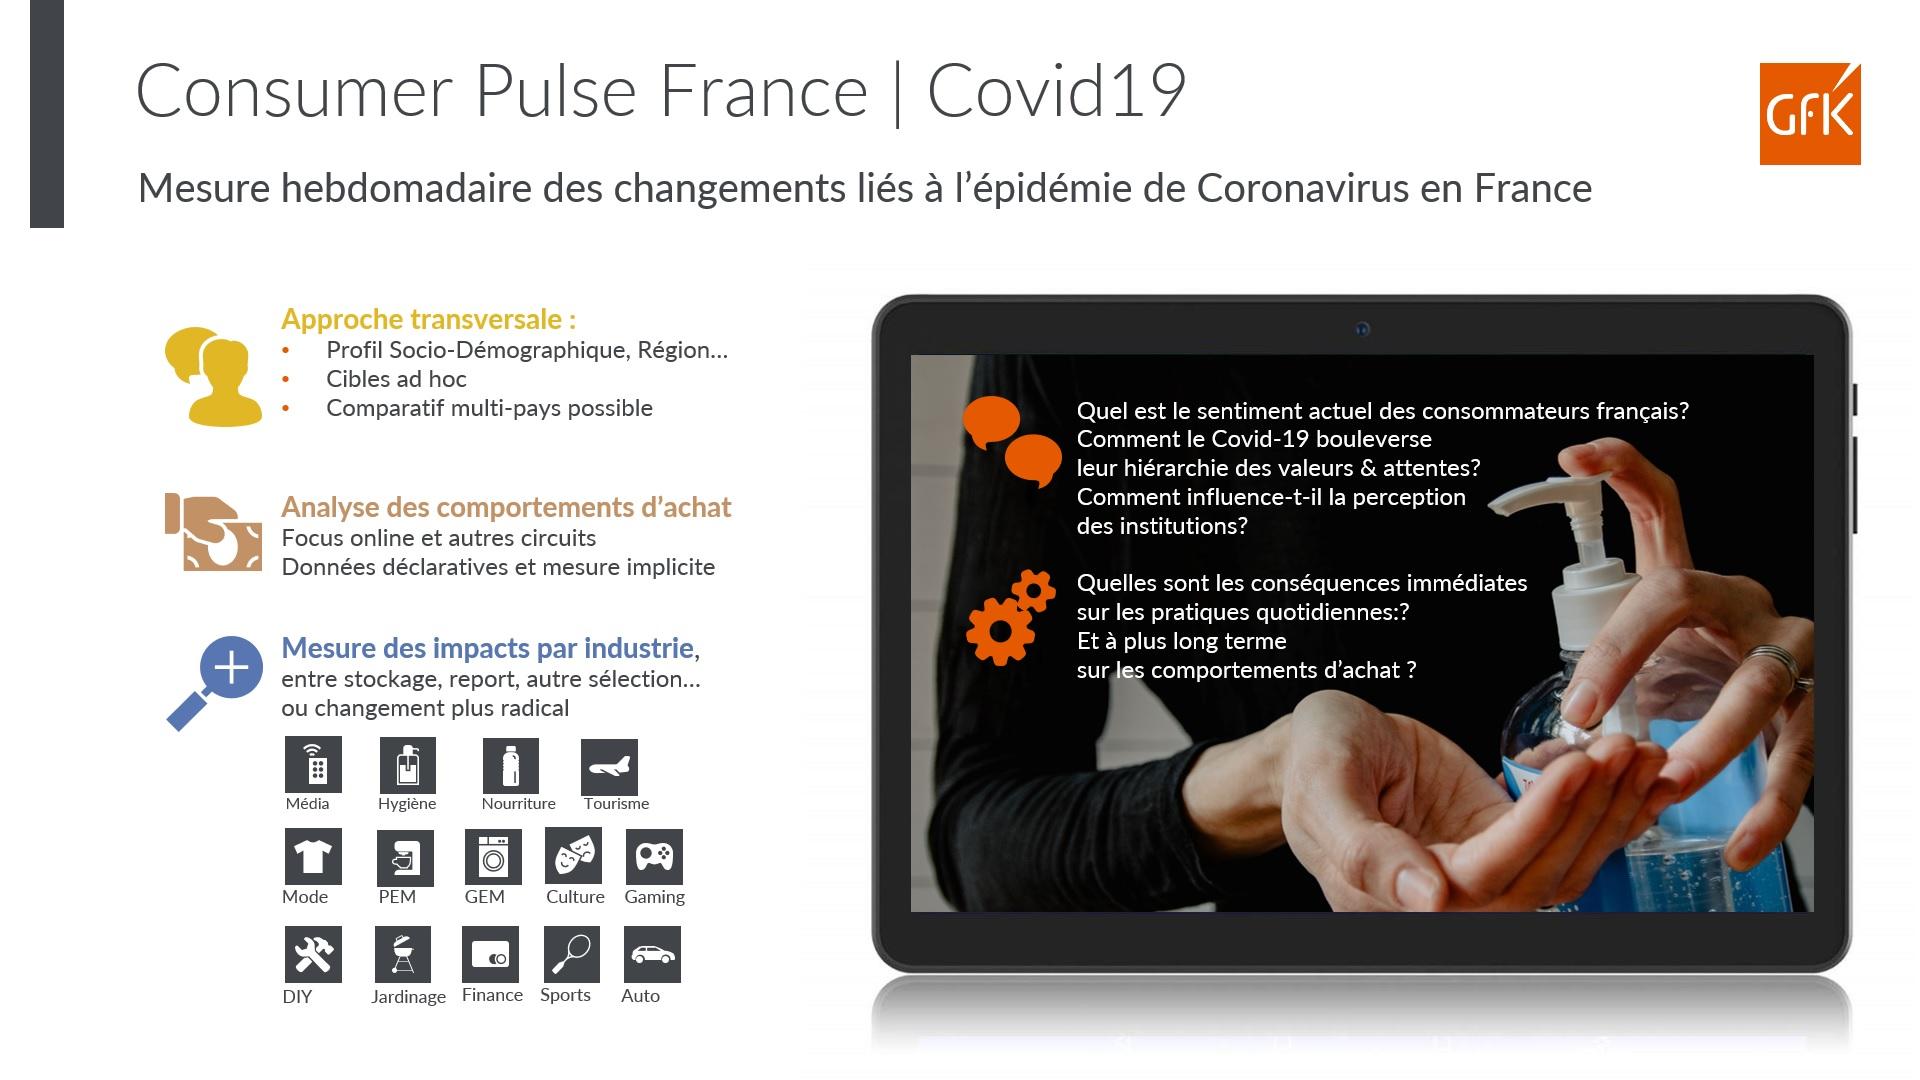 GfK_2020-ConsumerPulse_Covid19 France